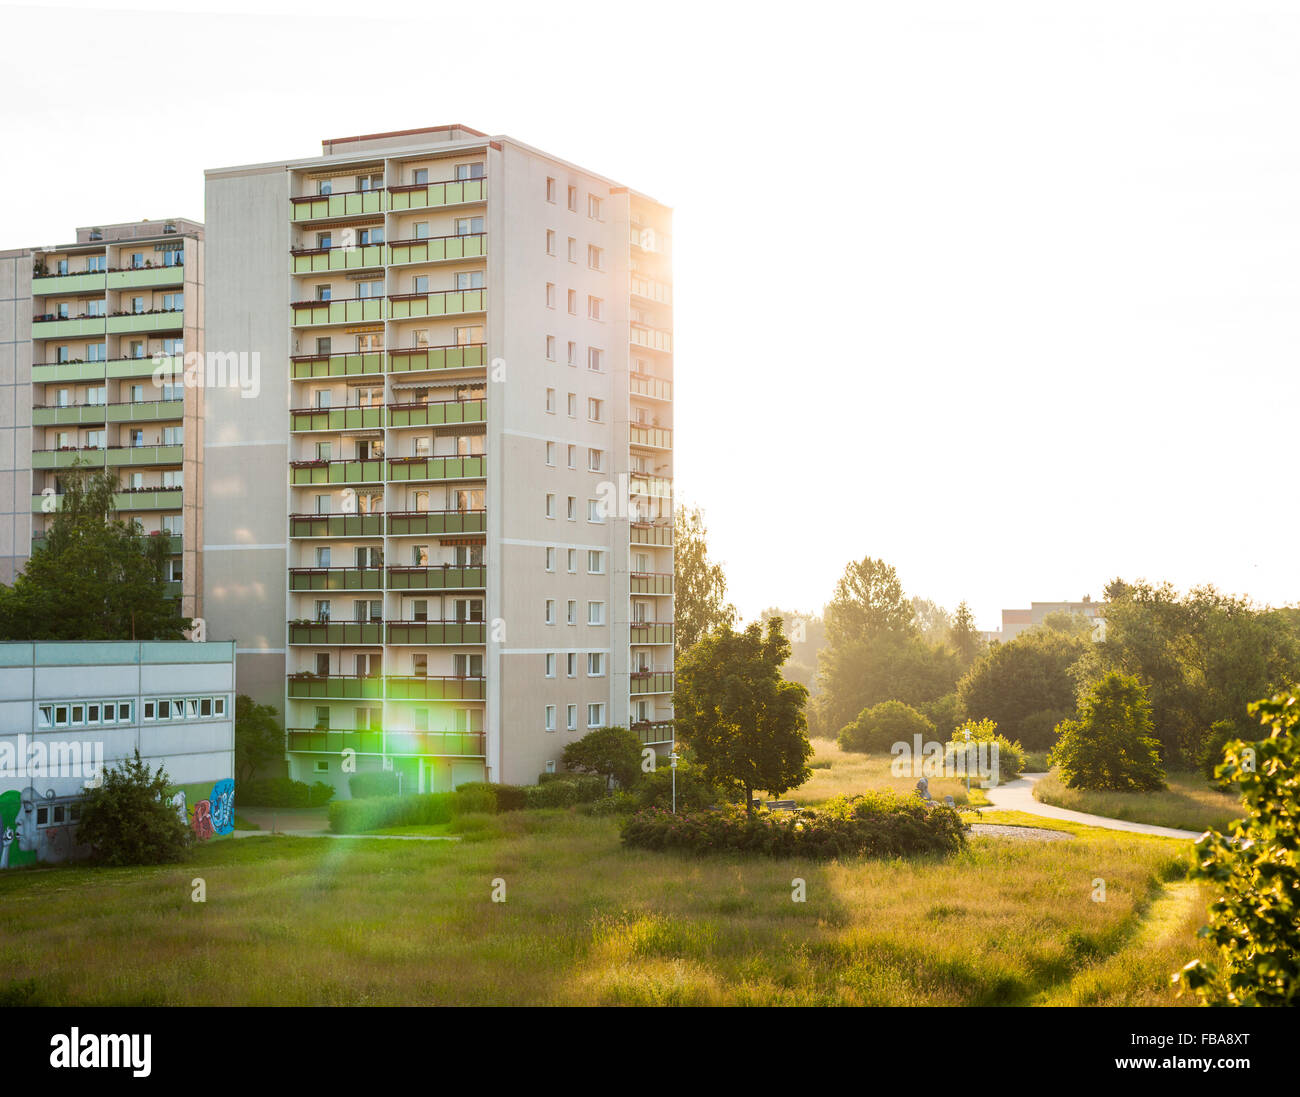 """Plattenbau"" style apartment buildings in Frankfurt (Oder), former East Germany Stock Photo"